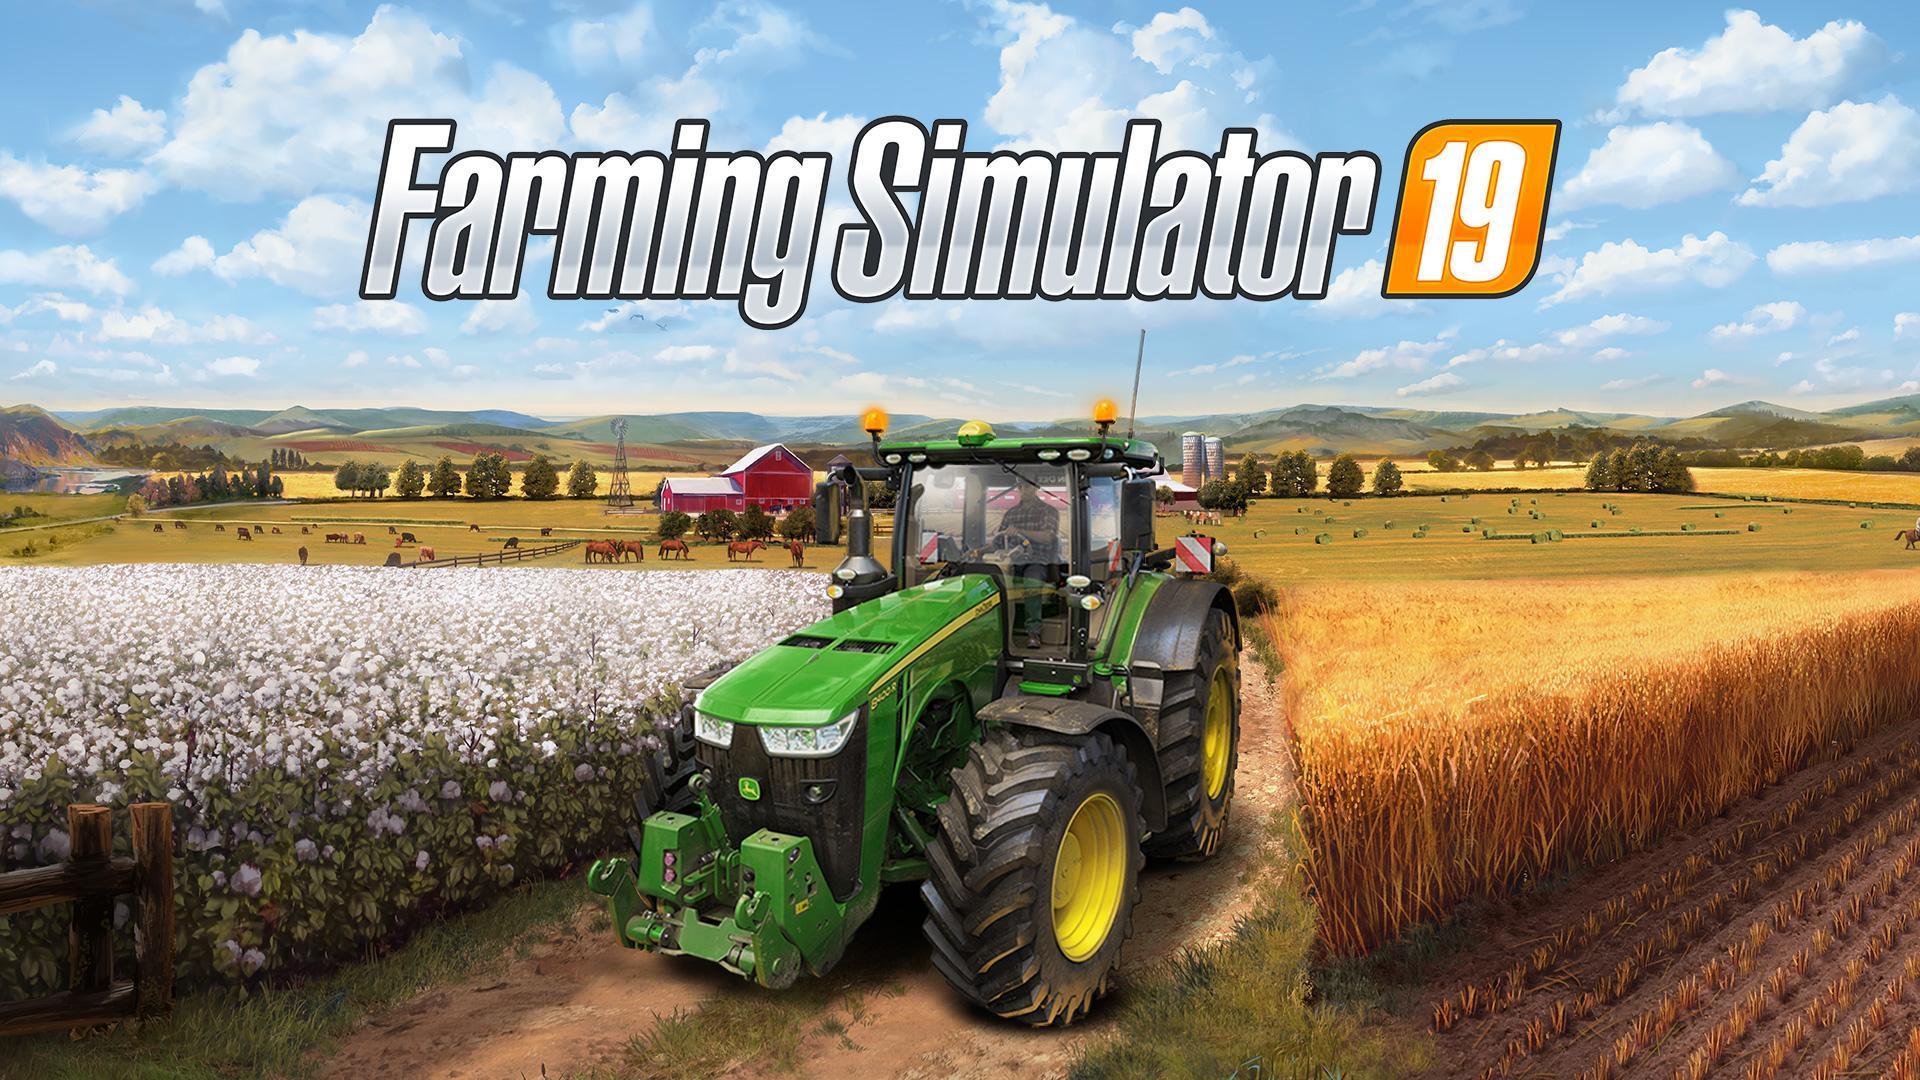 Farming Simulator 19 free full pc game for download